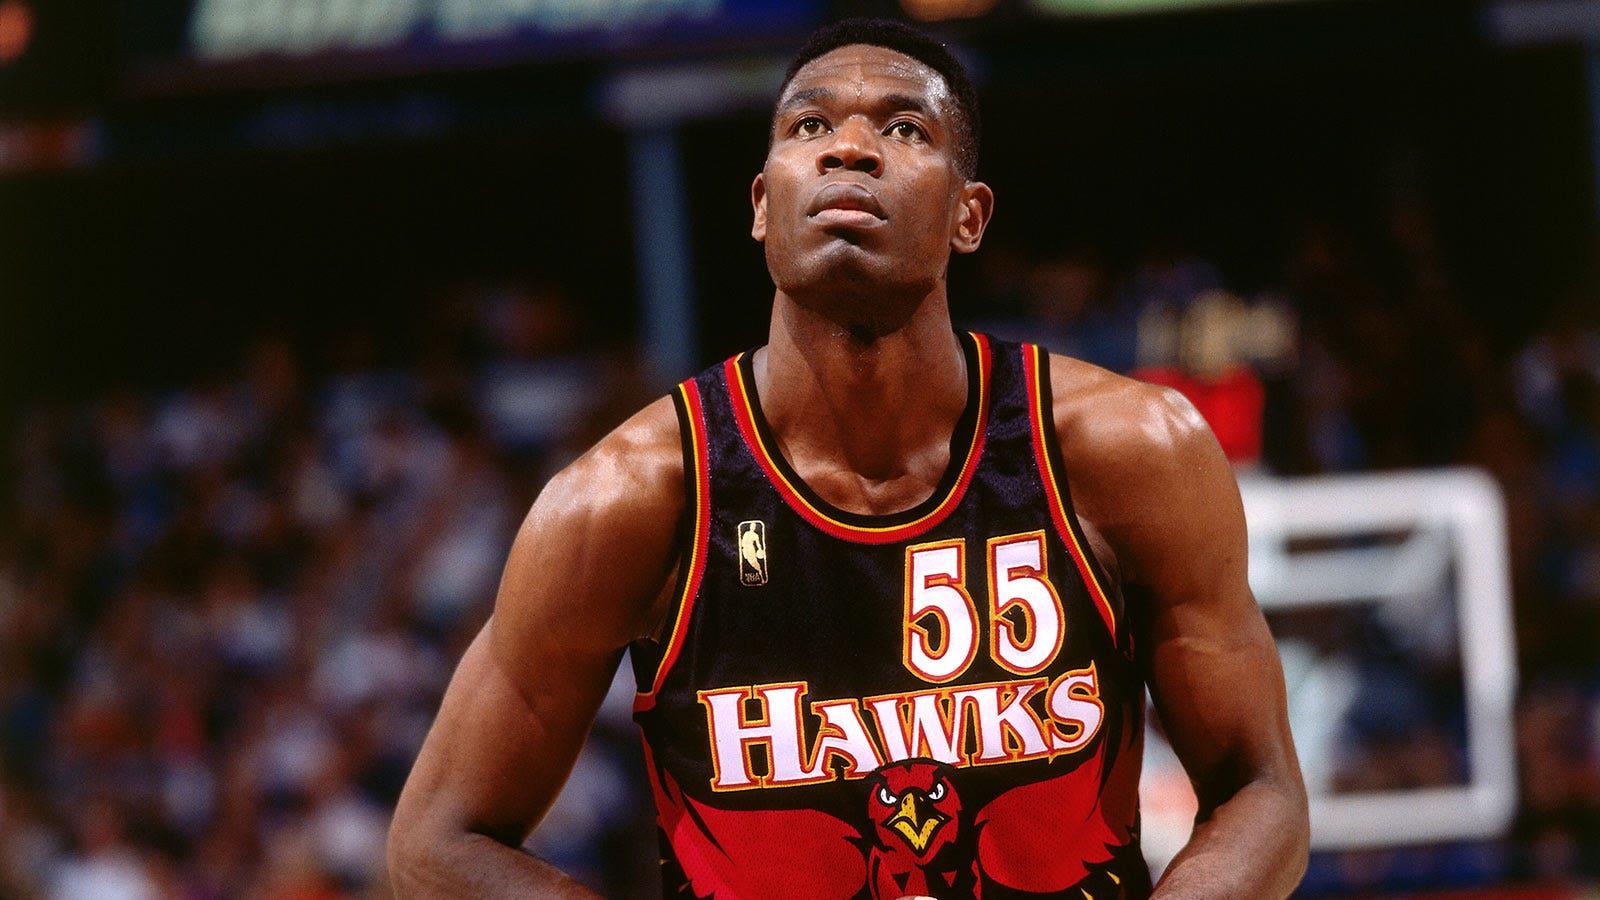 reputable site fb166 6dd82 Hawks to retire Dikembe Mutombo's No. 55 jersey | FOX Sports